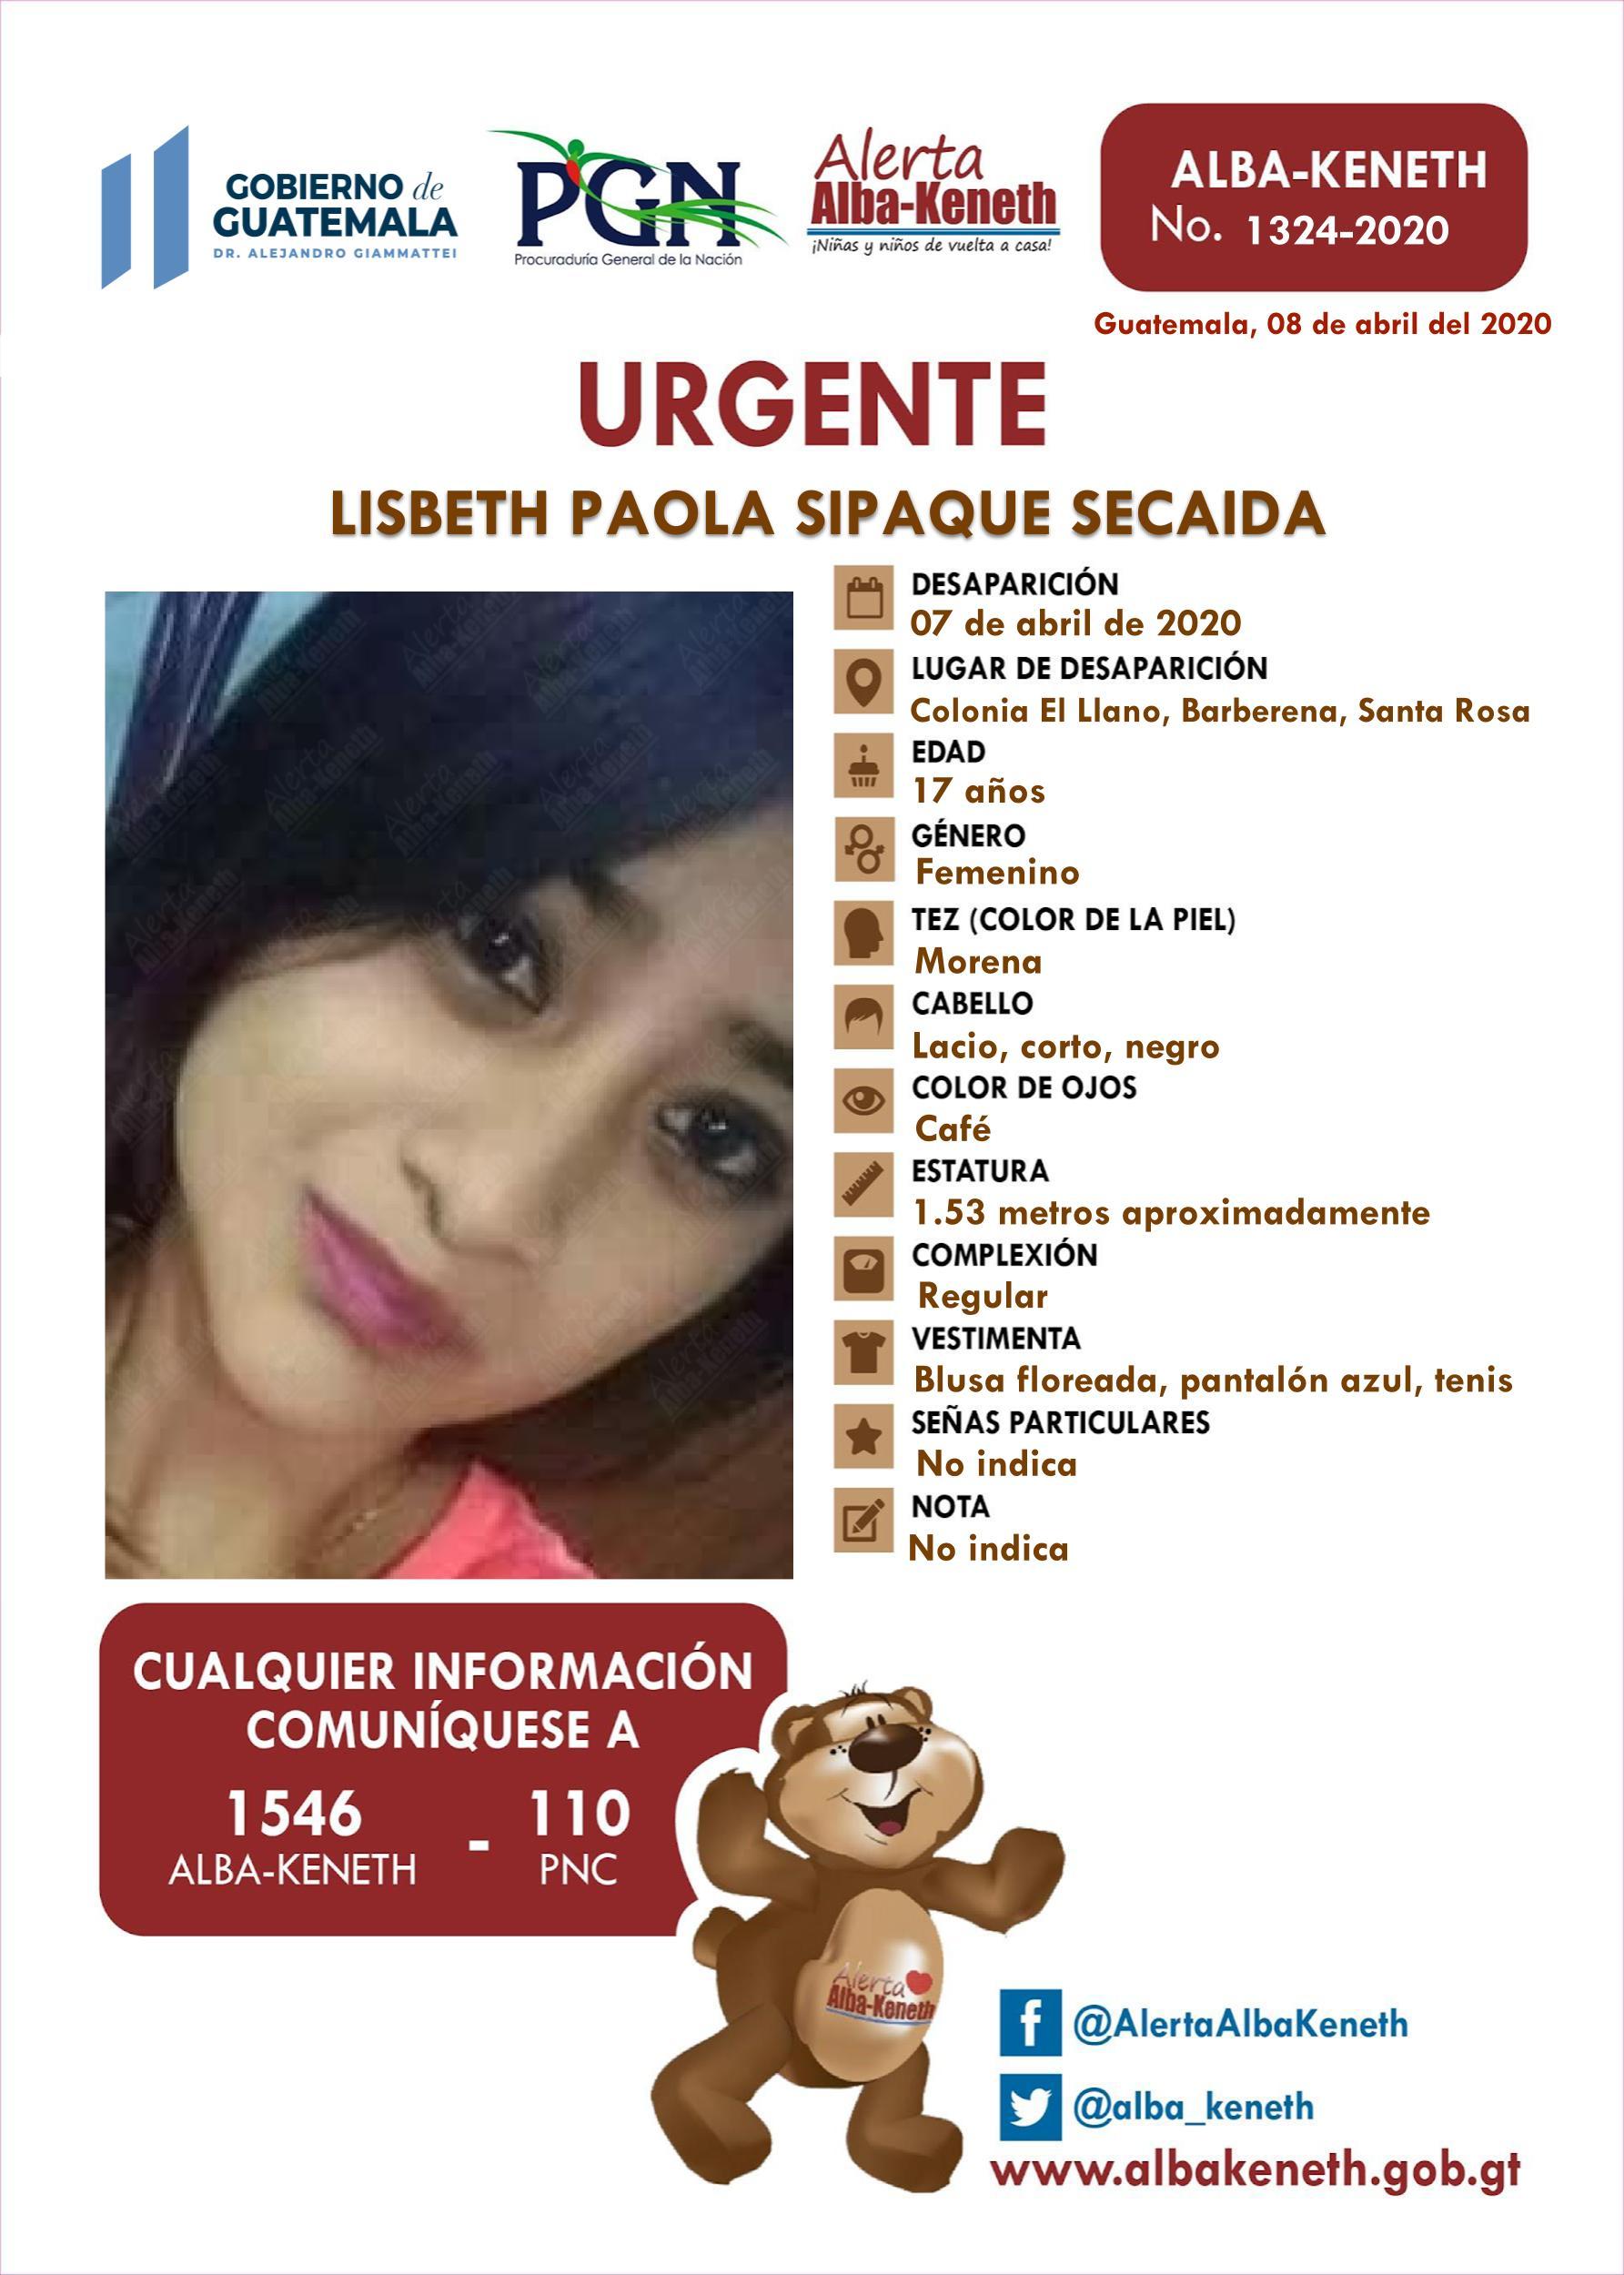 Lisbeth Paola Sipaque Secaida